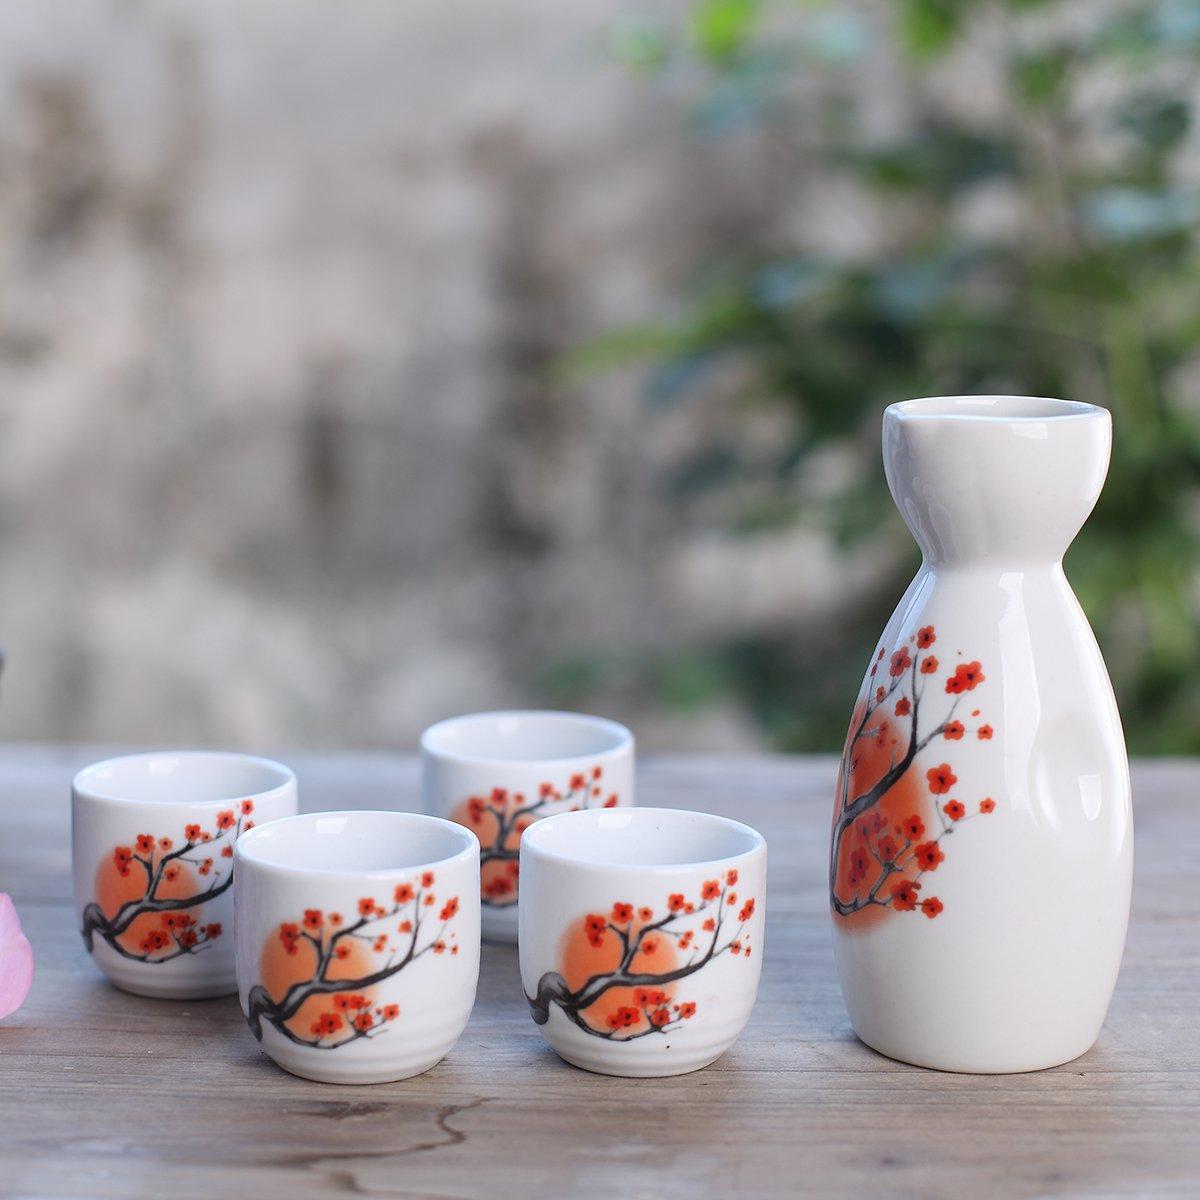 Tosnail 5 pcs Ceramic Japanese Sake Set - Orange Blossom by Tosnail (Image #7)